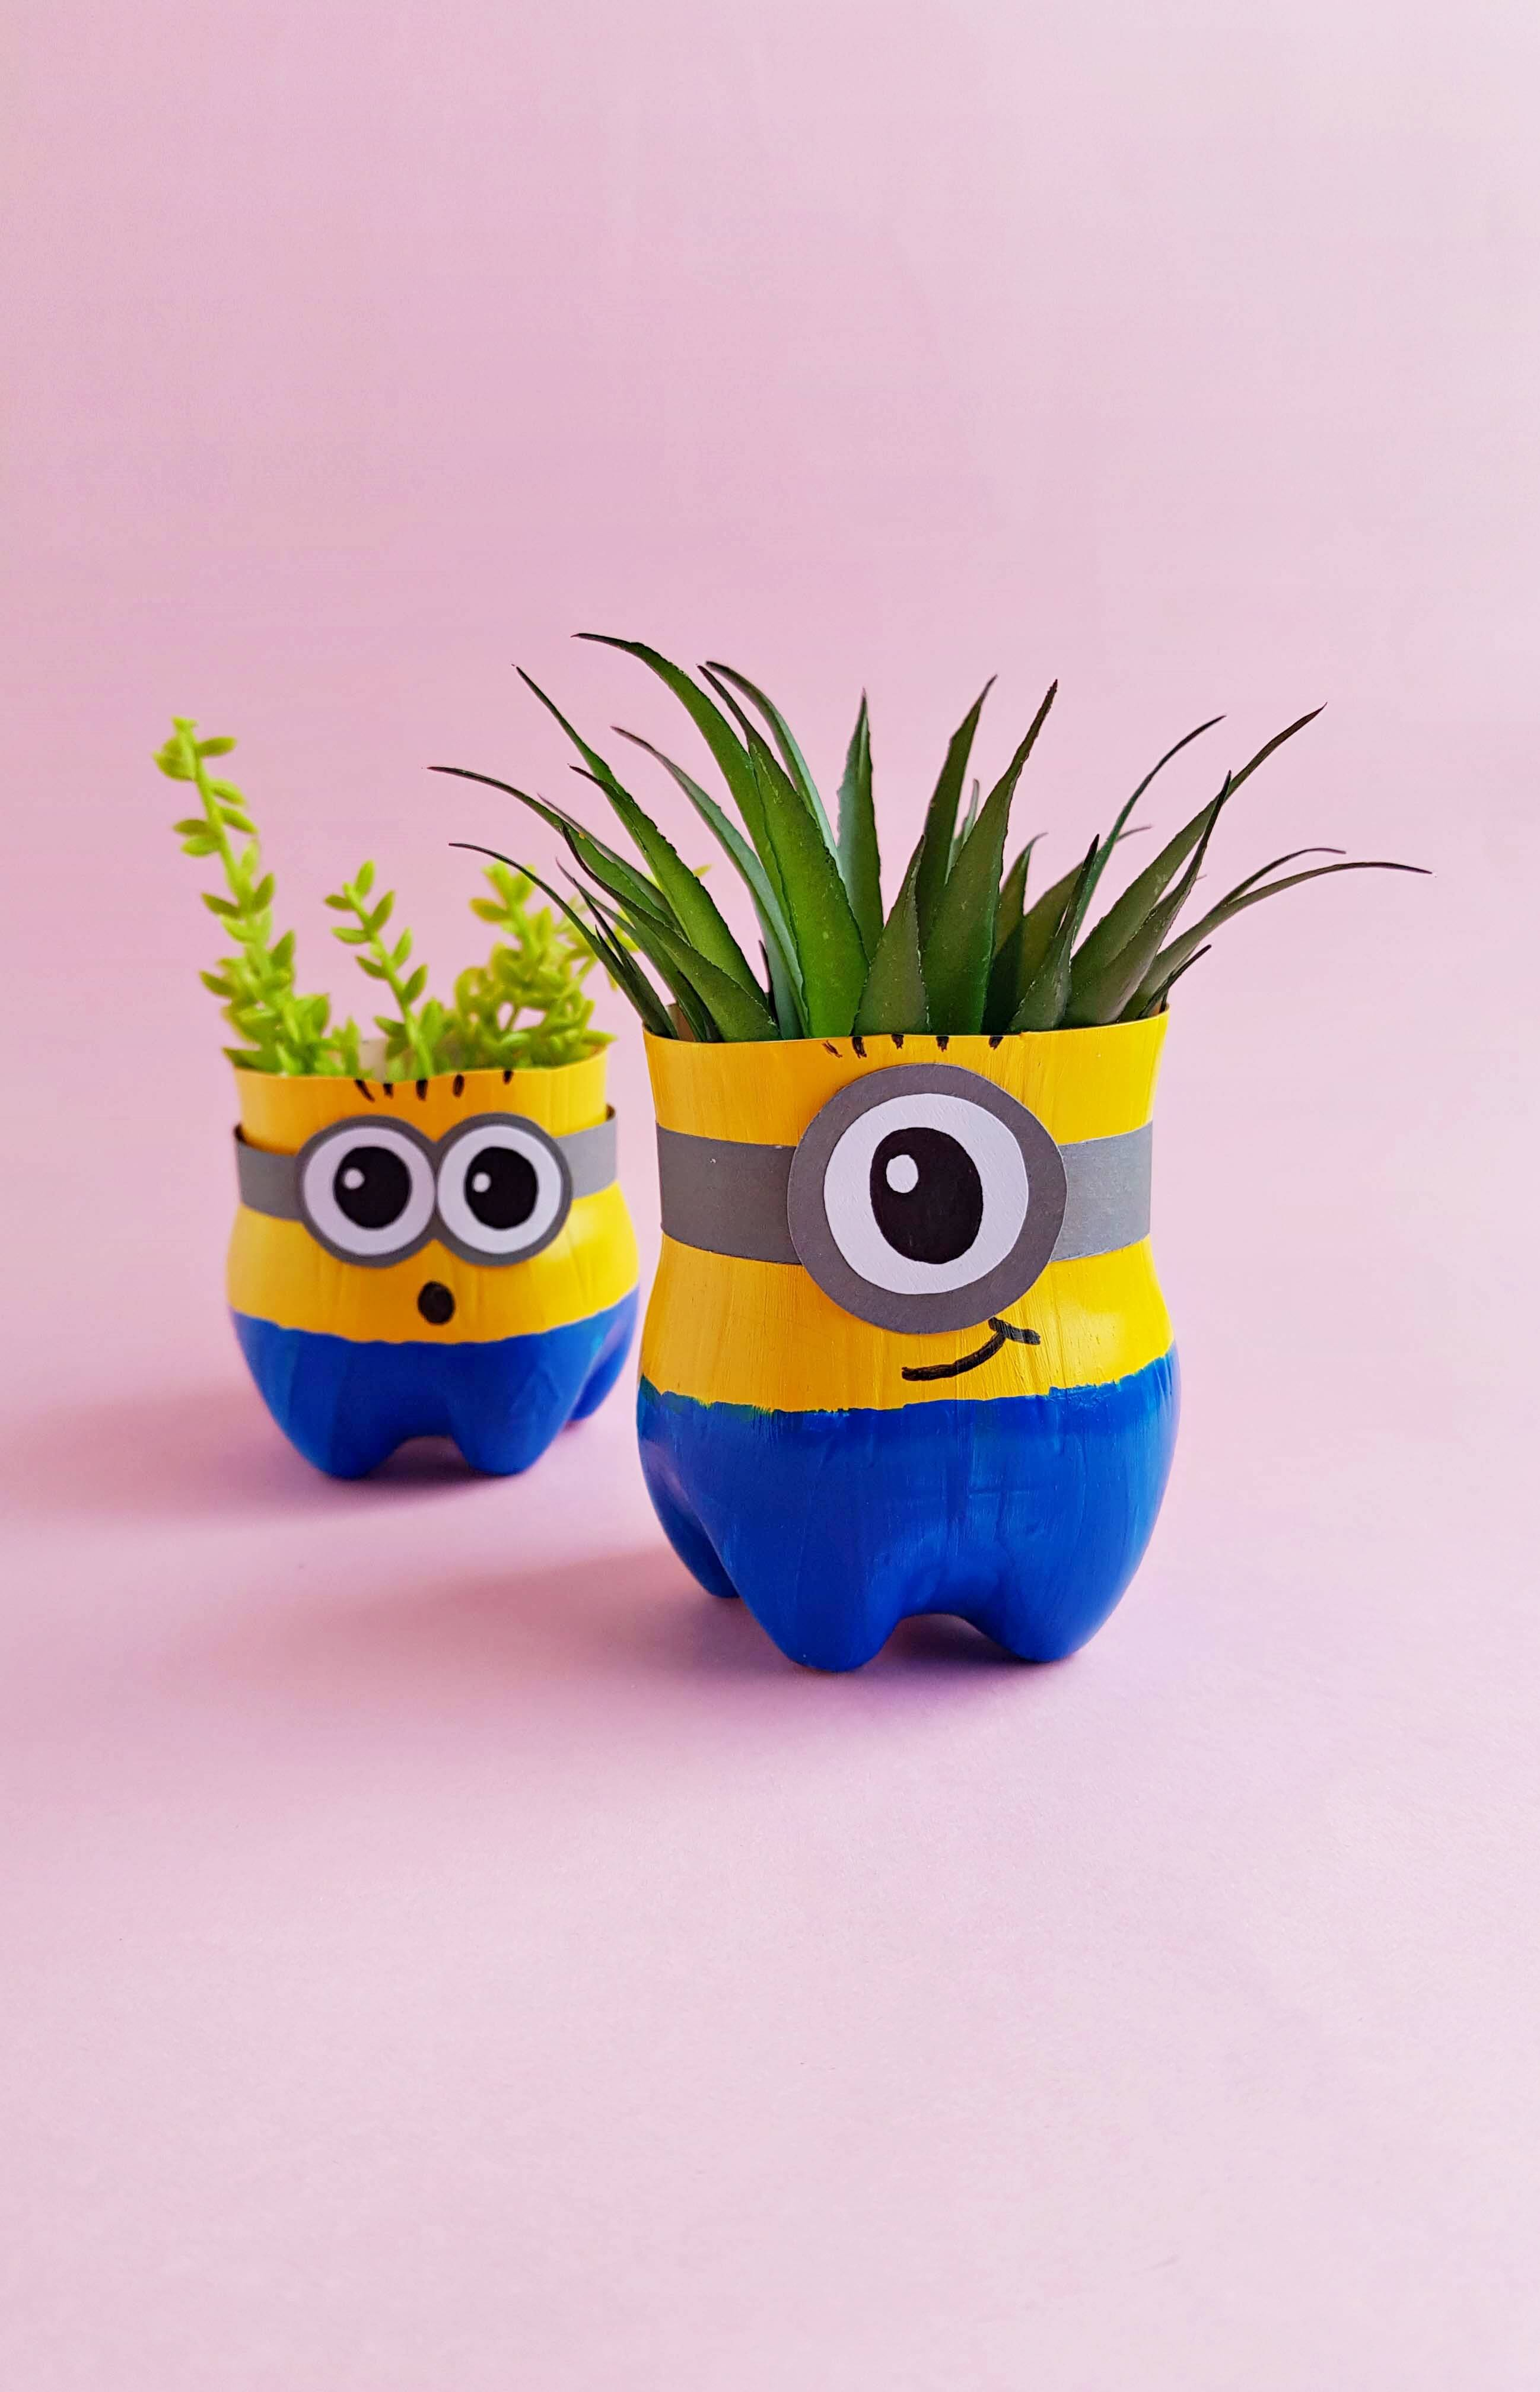 DIY Minion Planter